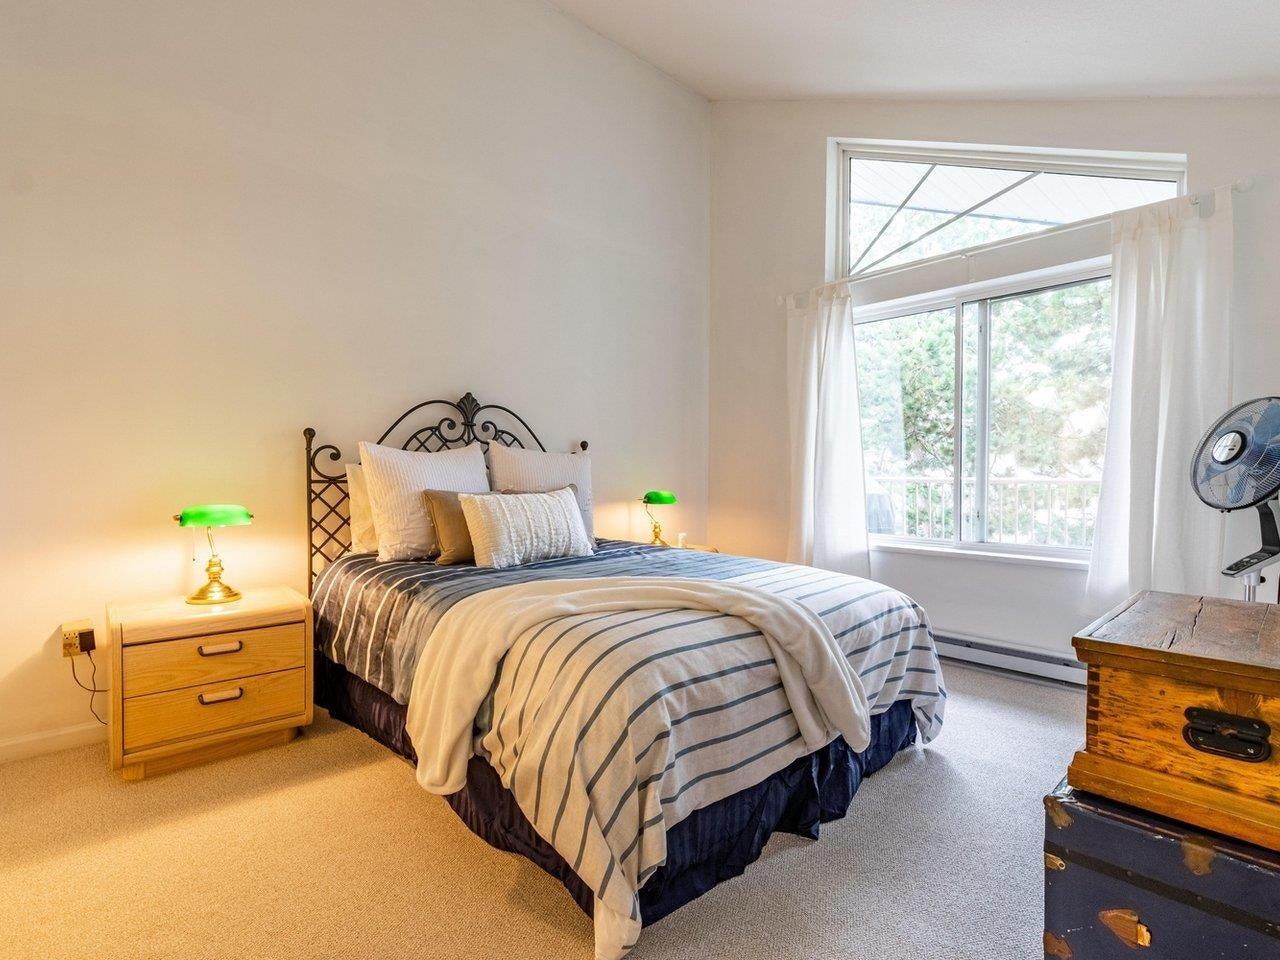 306 15298 20 AVENUE - King George Corridor Apartment/Condo for sale, 2 Bedrooms (R2625551) - #20